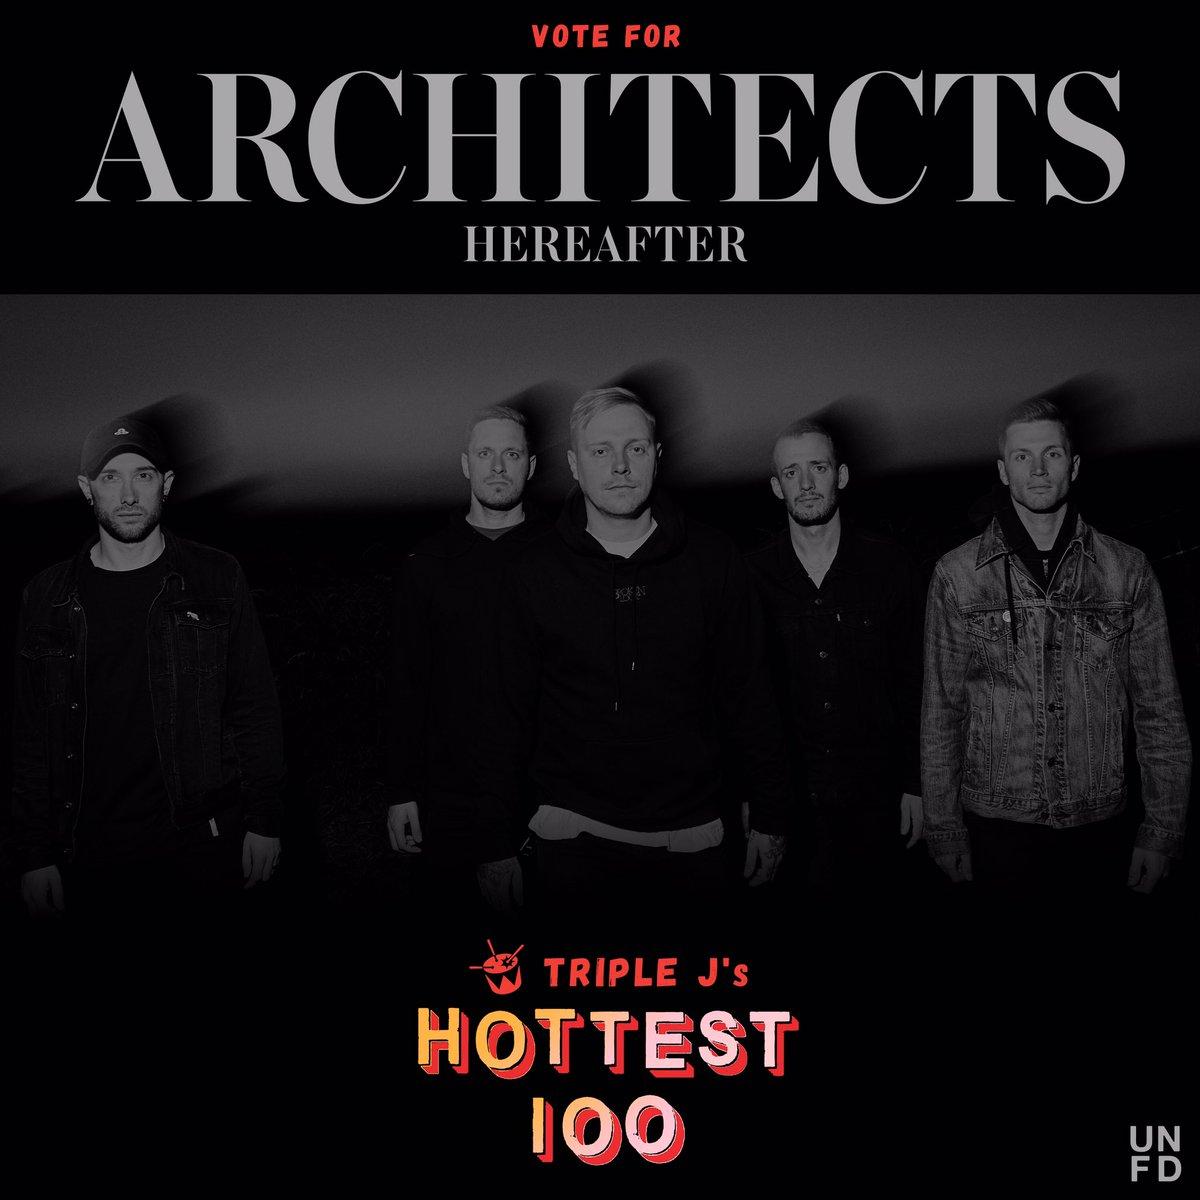 RT @MDDNco: ???????????????????? @Architects up for @triplej hottest 100. Vote here https://t.co/XLneSl9zAp https://t.co/NMHsXkT46T